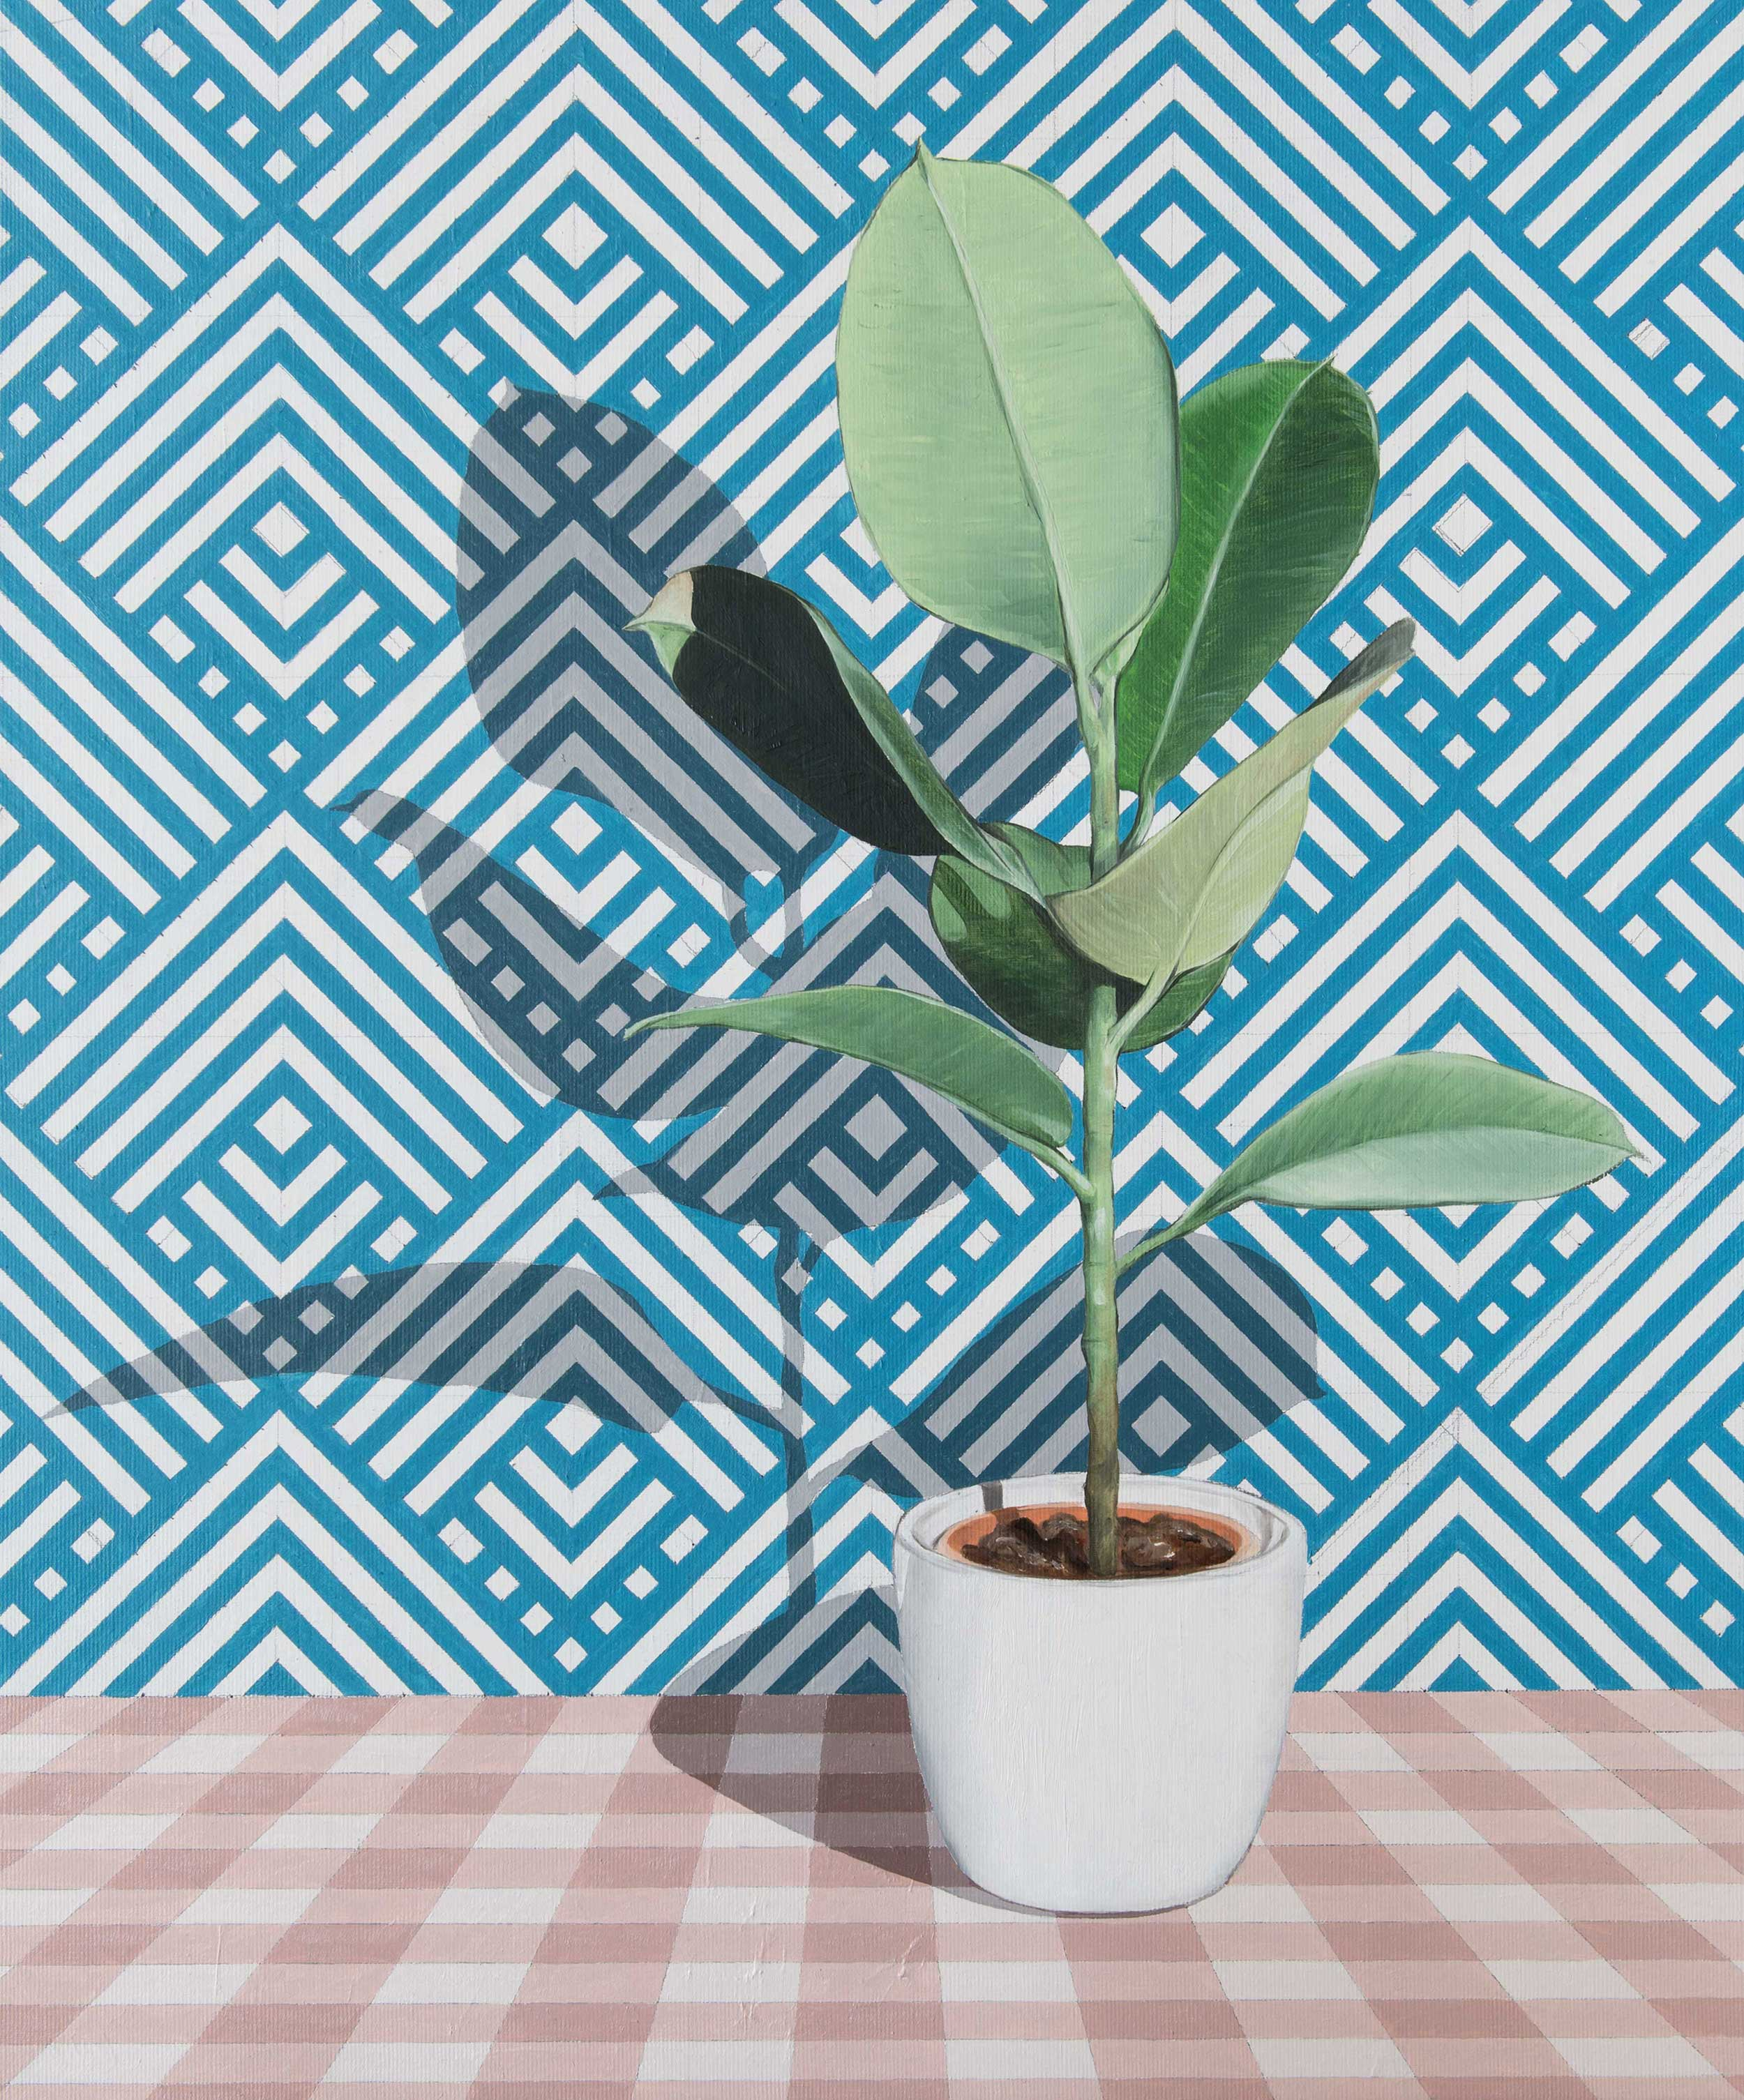 Christopher Kieling: Ficus_Elastica_A_1, 2020